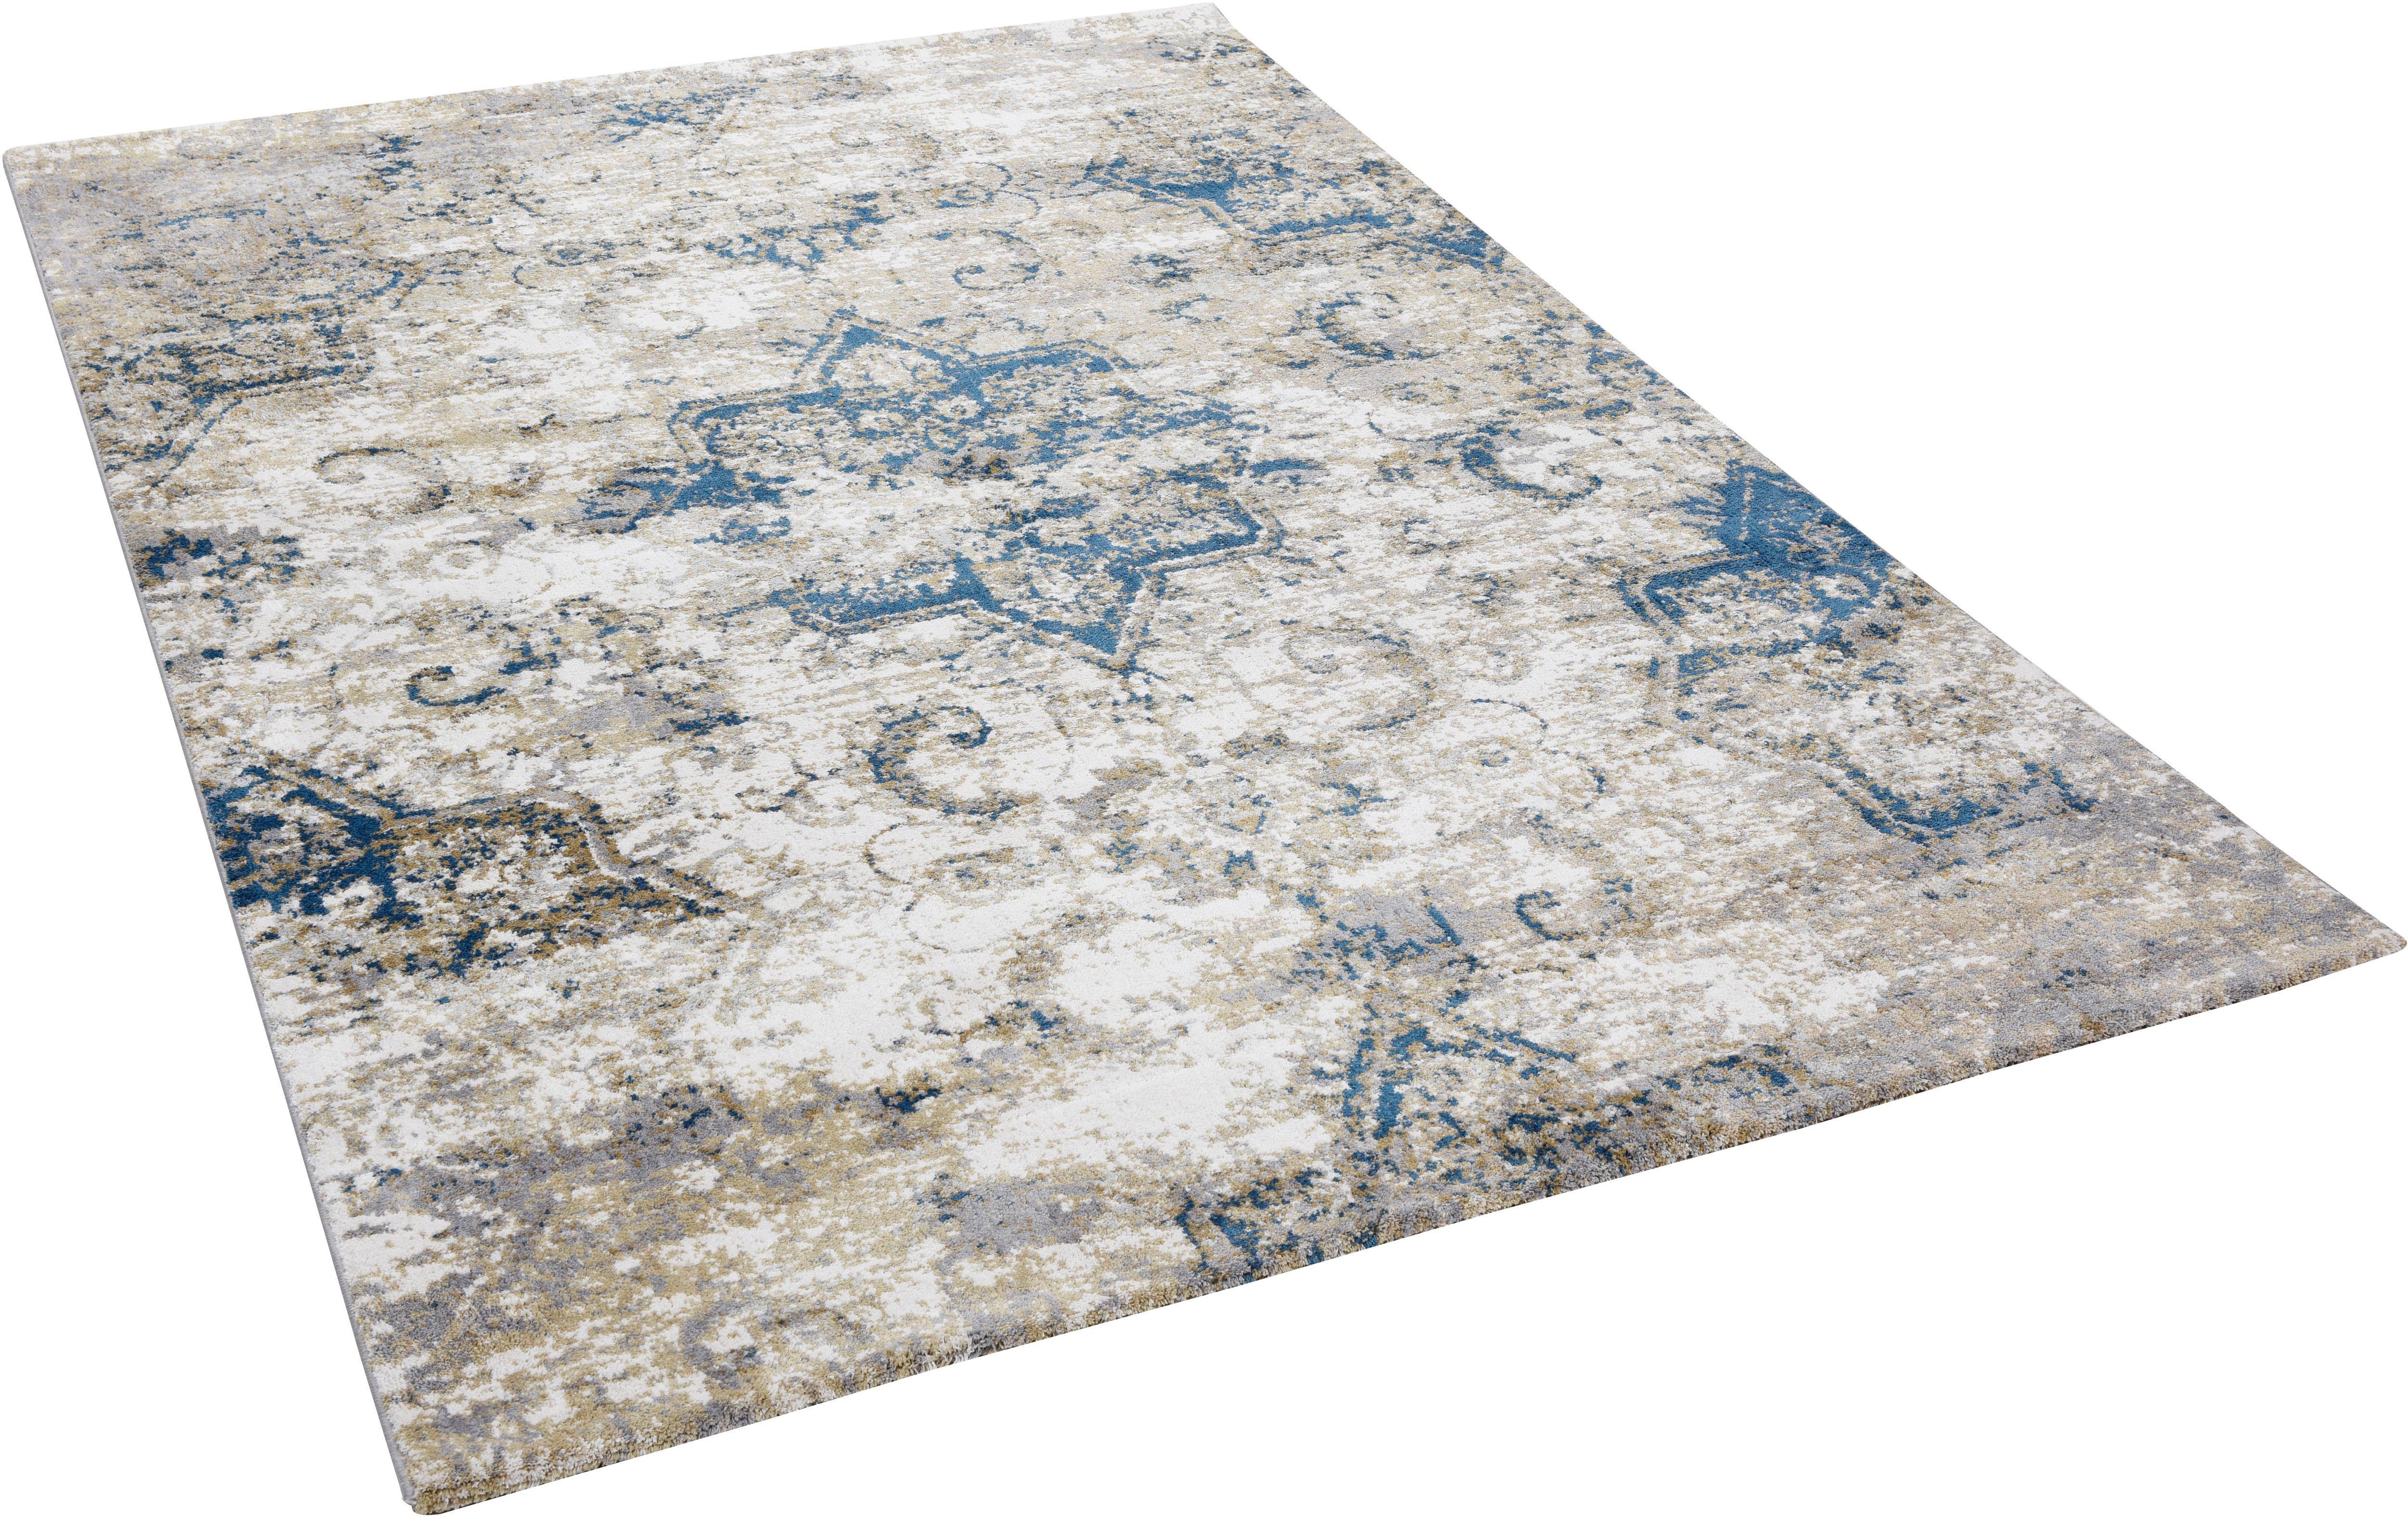 Teppich Anna Maria orient Gino Falcone rechteckig Höhe 20 mm maschinell gewebt